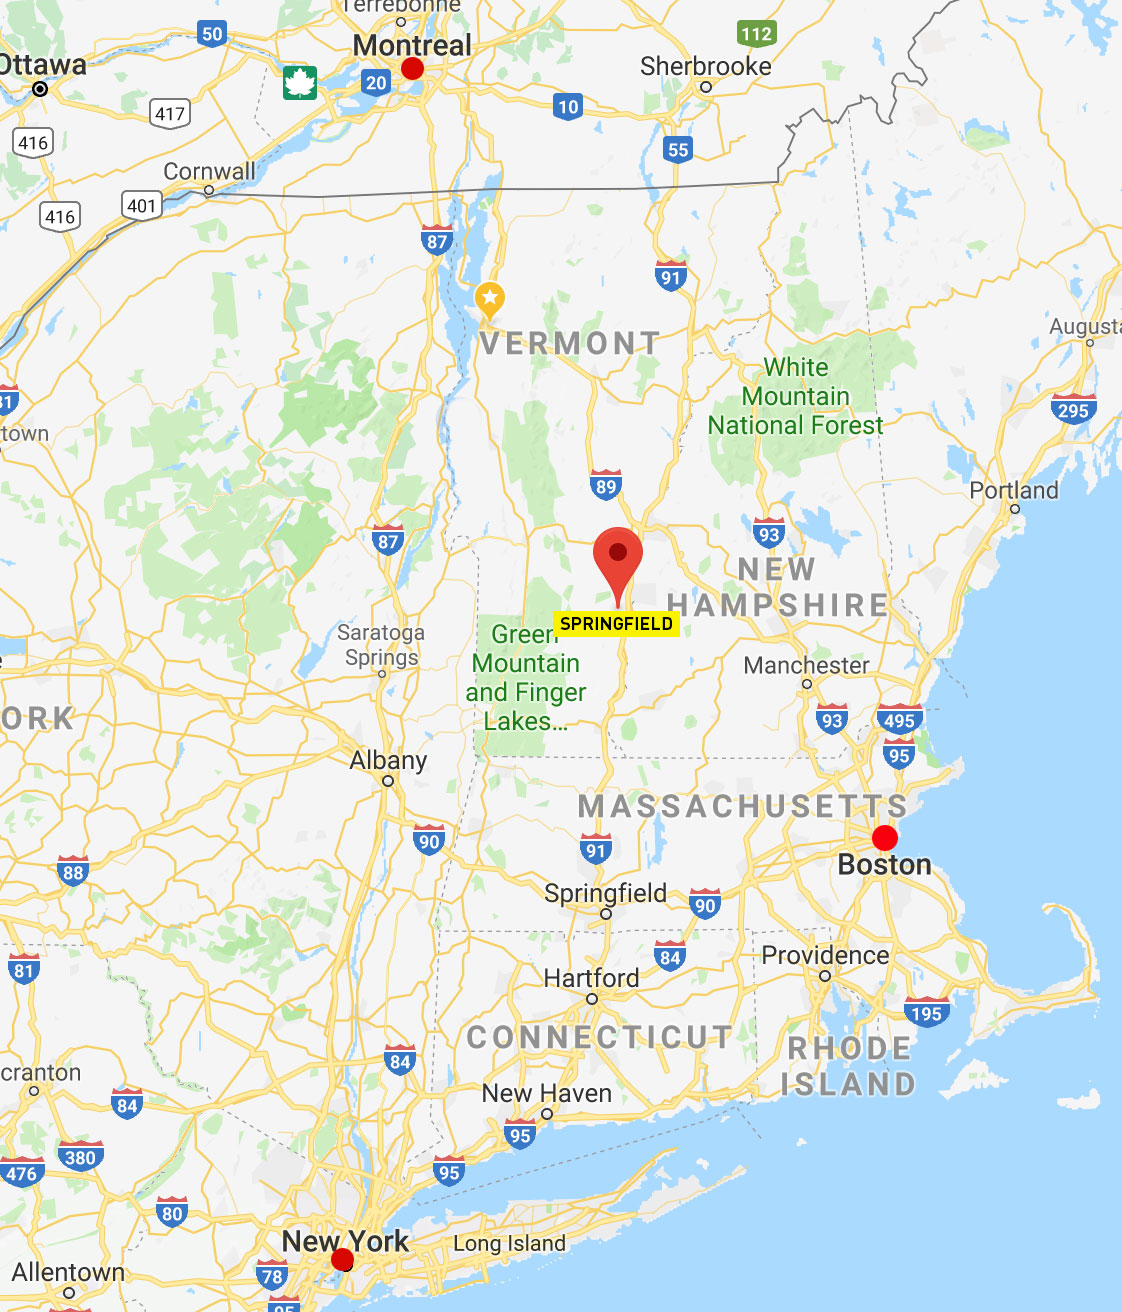 SPRINGFIELD_MAP.jpg